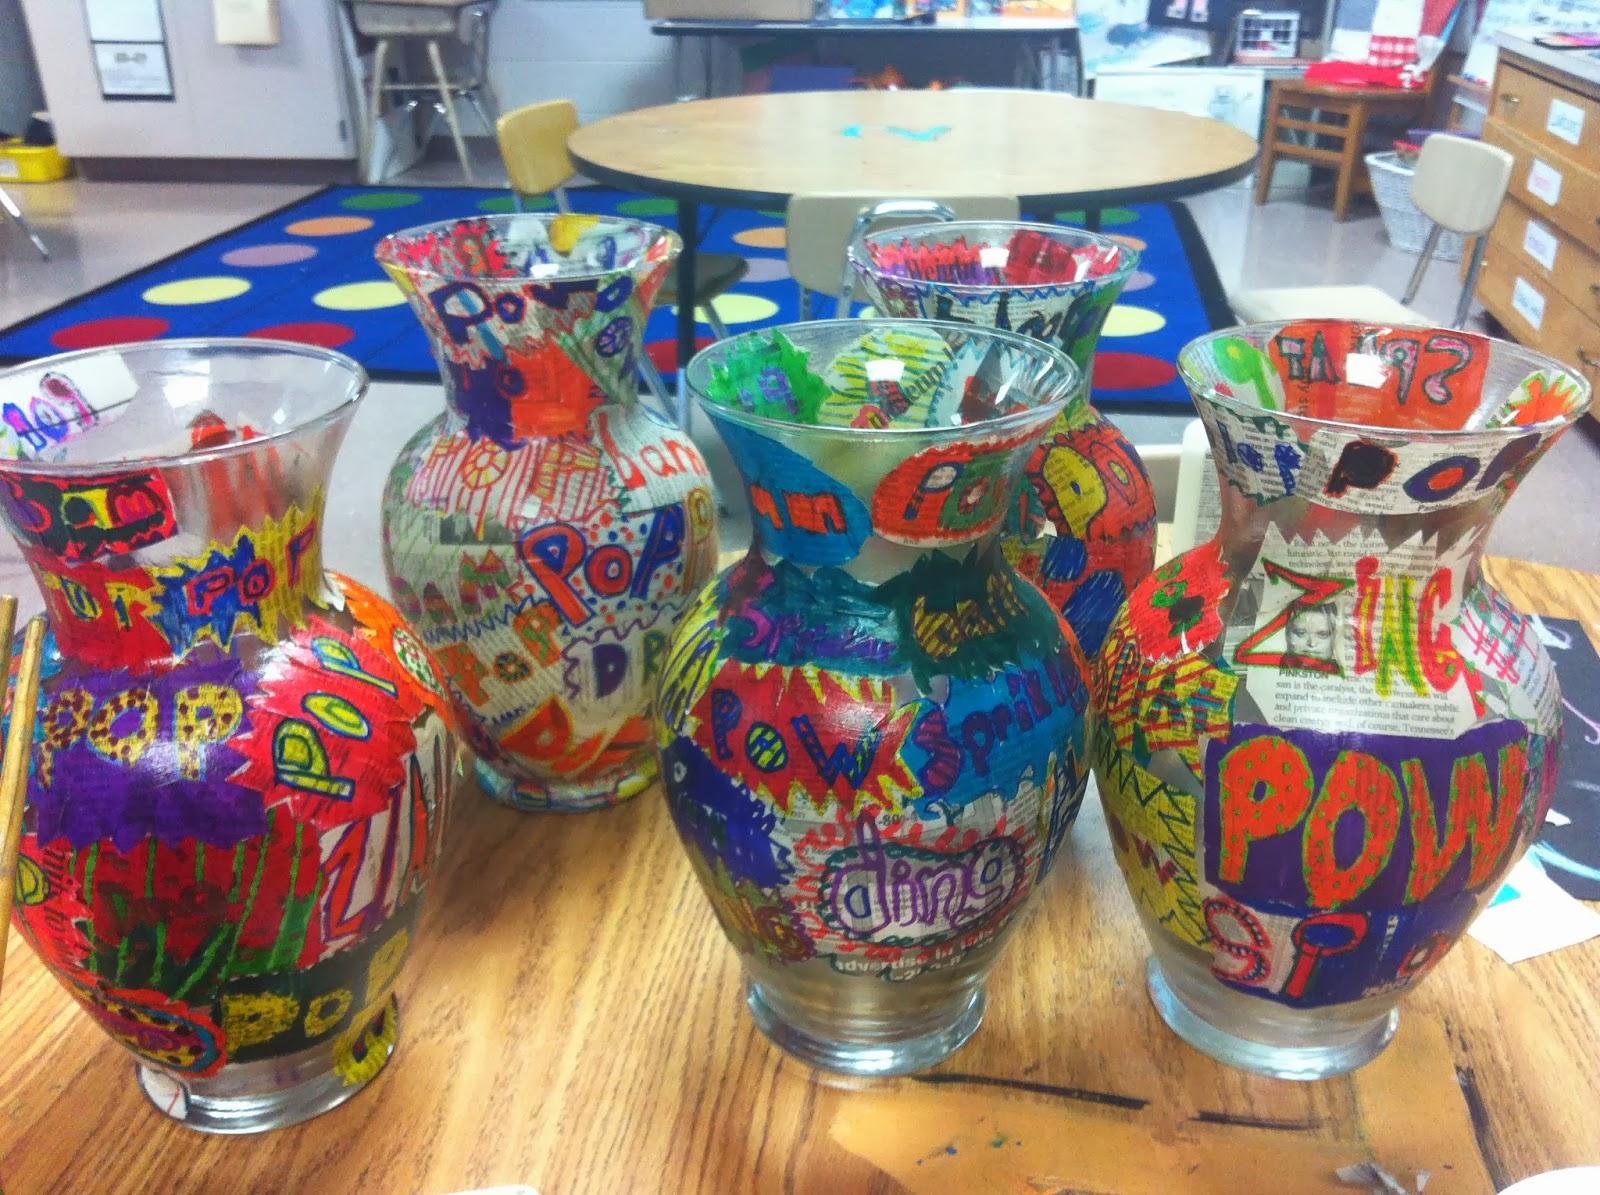 Chumleyscobey Art Room Pop Art Vases 3rd Grade Auction Project